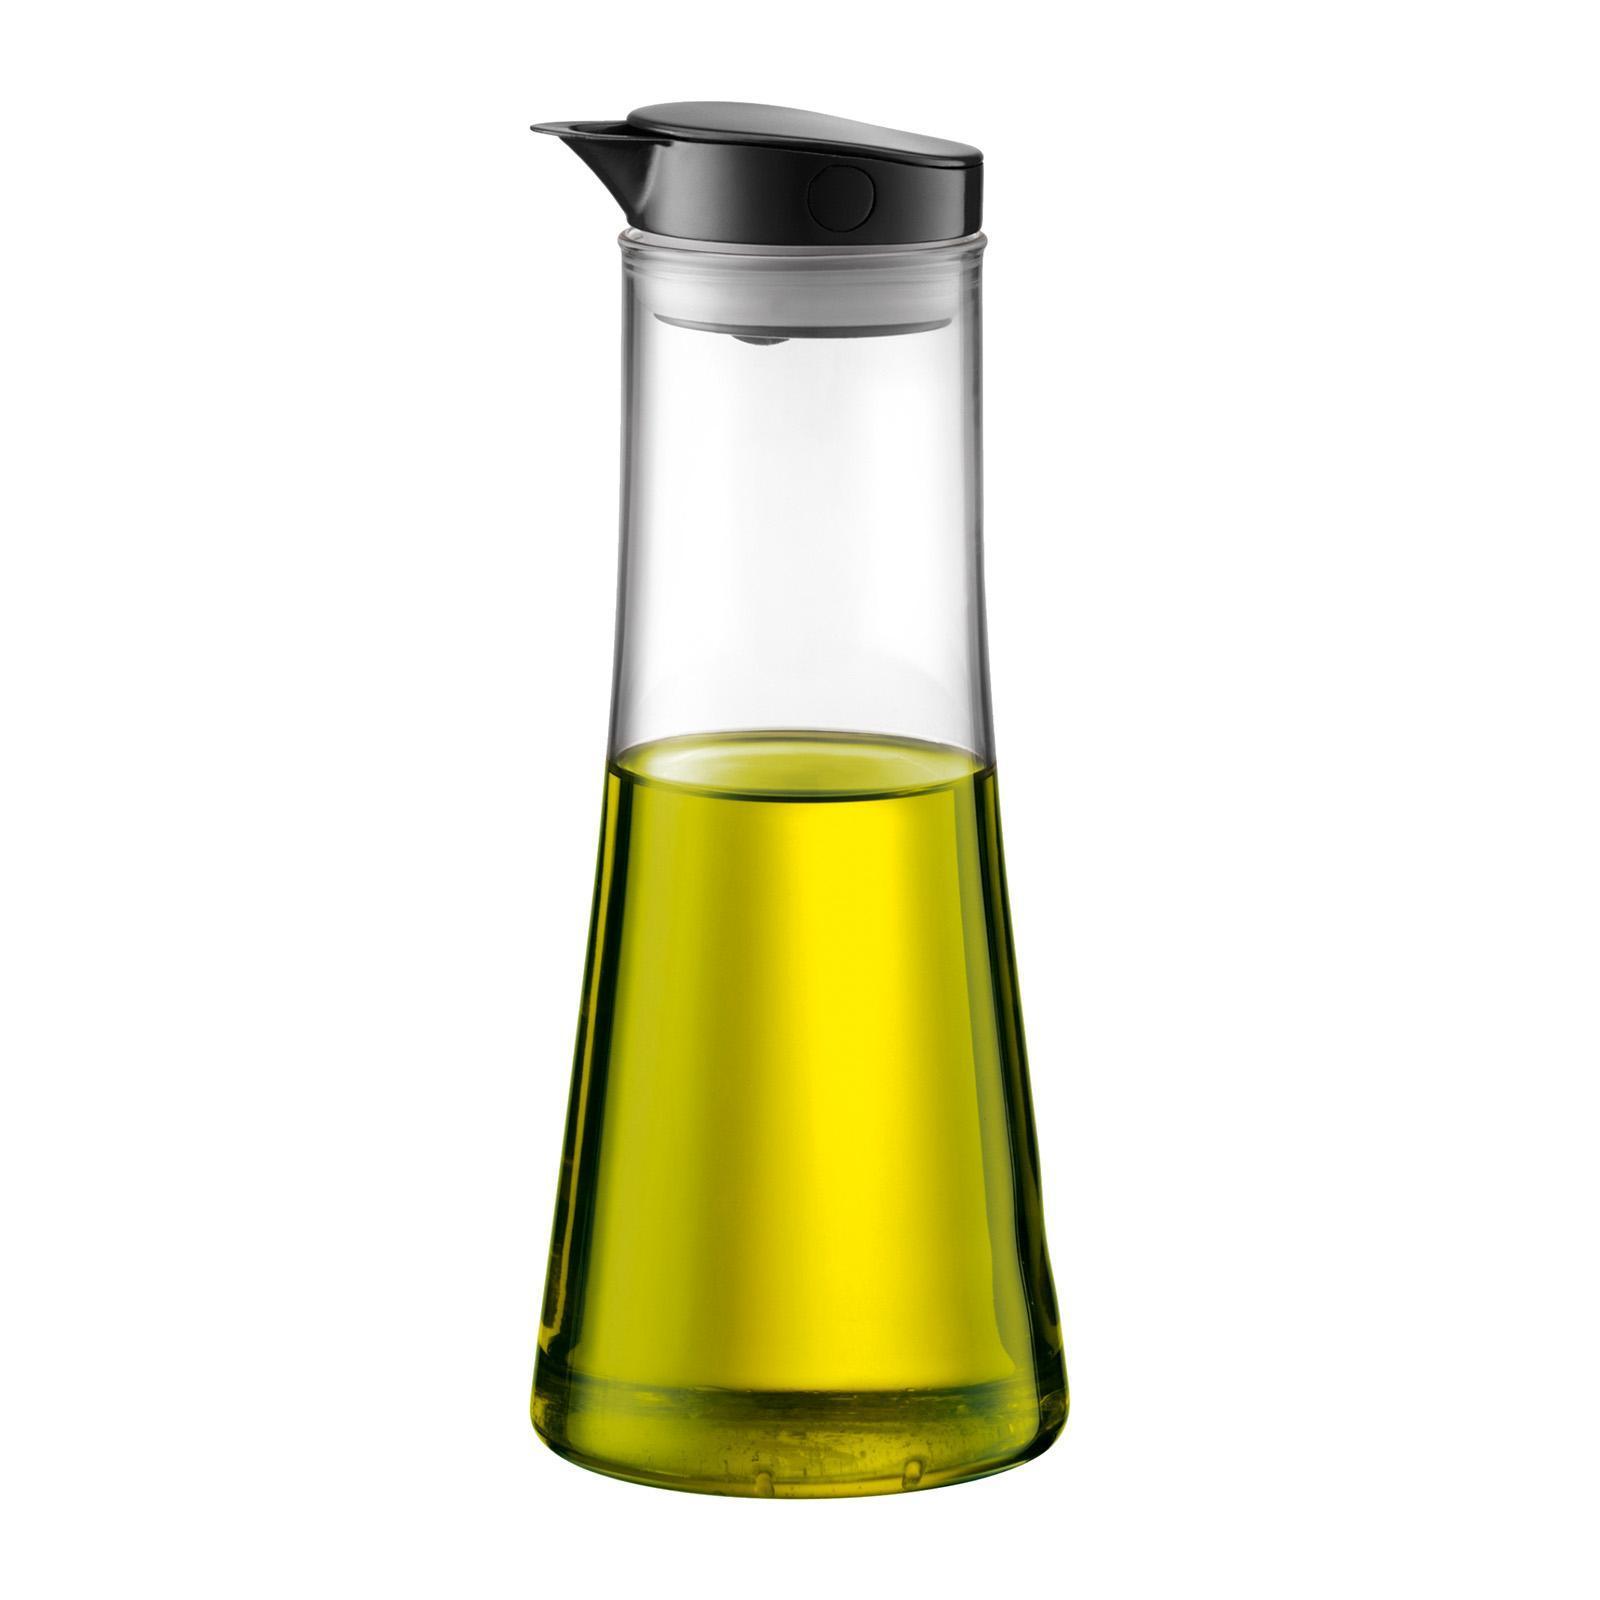 Bodum Bistro Oil And Vinger Dispenser 0.5 L/17oz - Black